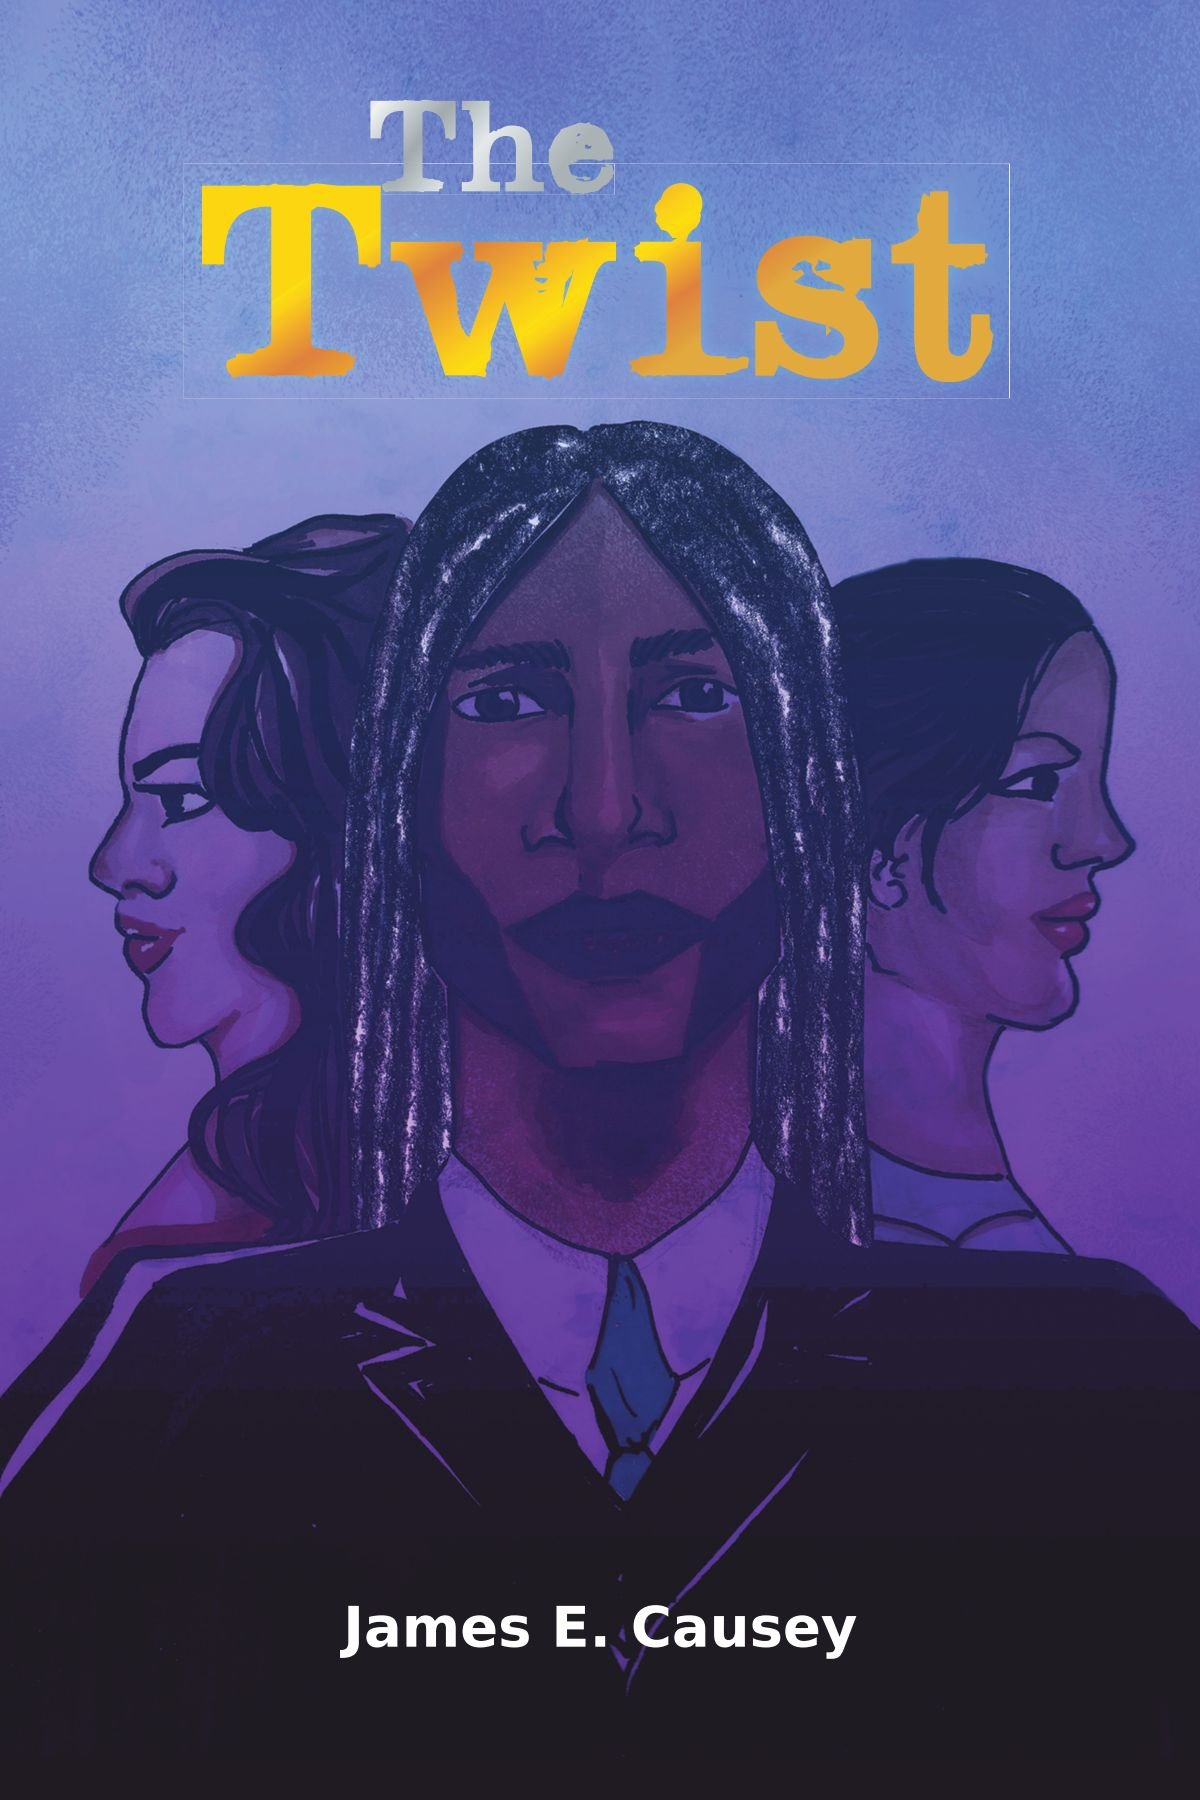 Download The Twist ePub fb2 book